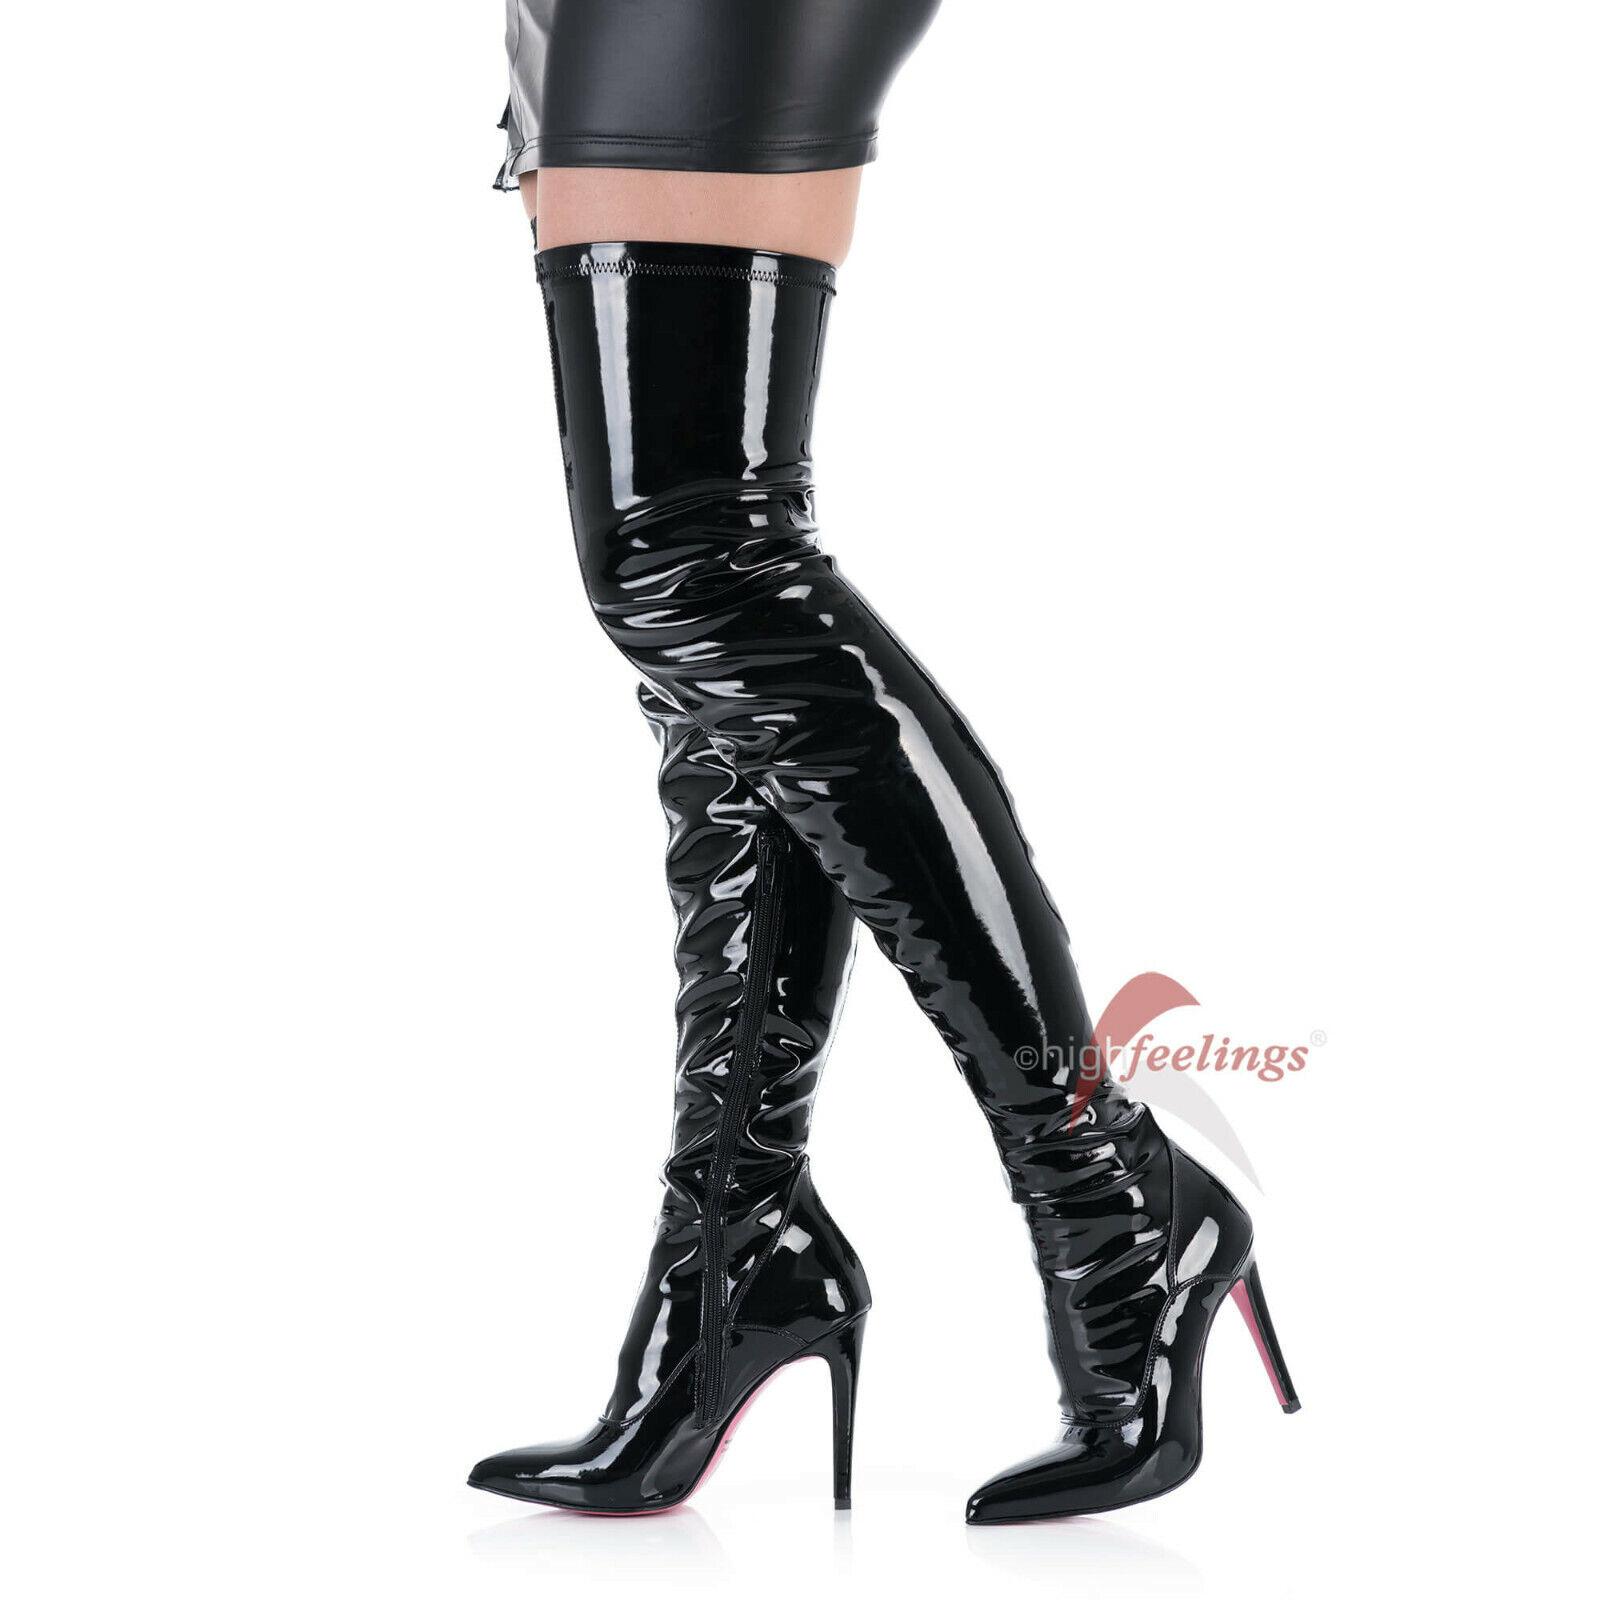 10 Stretch Schwarz Heels High Stiefel Lack Overknee 12 47